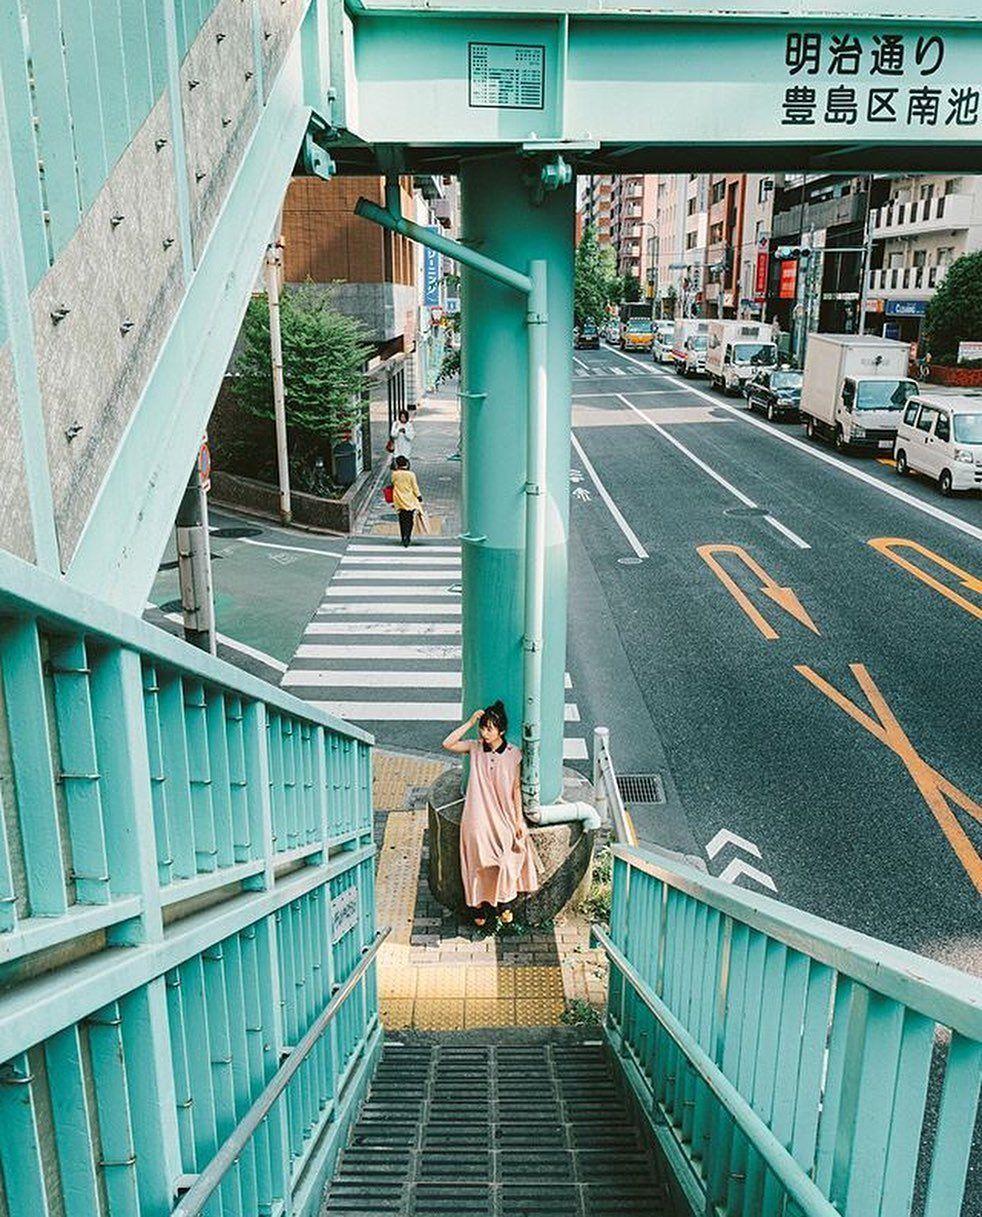 Featured artist @takerukohara_sono1 with @_nanasemaruuu_ via @specialsgallery #CLASSICSMAGAZINE  #cinematic #special_spot_ #daily_photo_jpn #月刊8月のクリスマス #art_of_japan #その瞬間に物語を #moodytones #daily_photo_jpn #デジタルでフィルムを再現したい #moody #filmcommunity #japan_art_photography #tokyocameraclub #bestjapanpics_ #東北photogram #retrip_nippon #cine #jp_mood #スクリーンに恋して